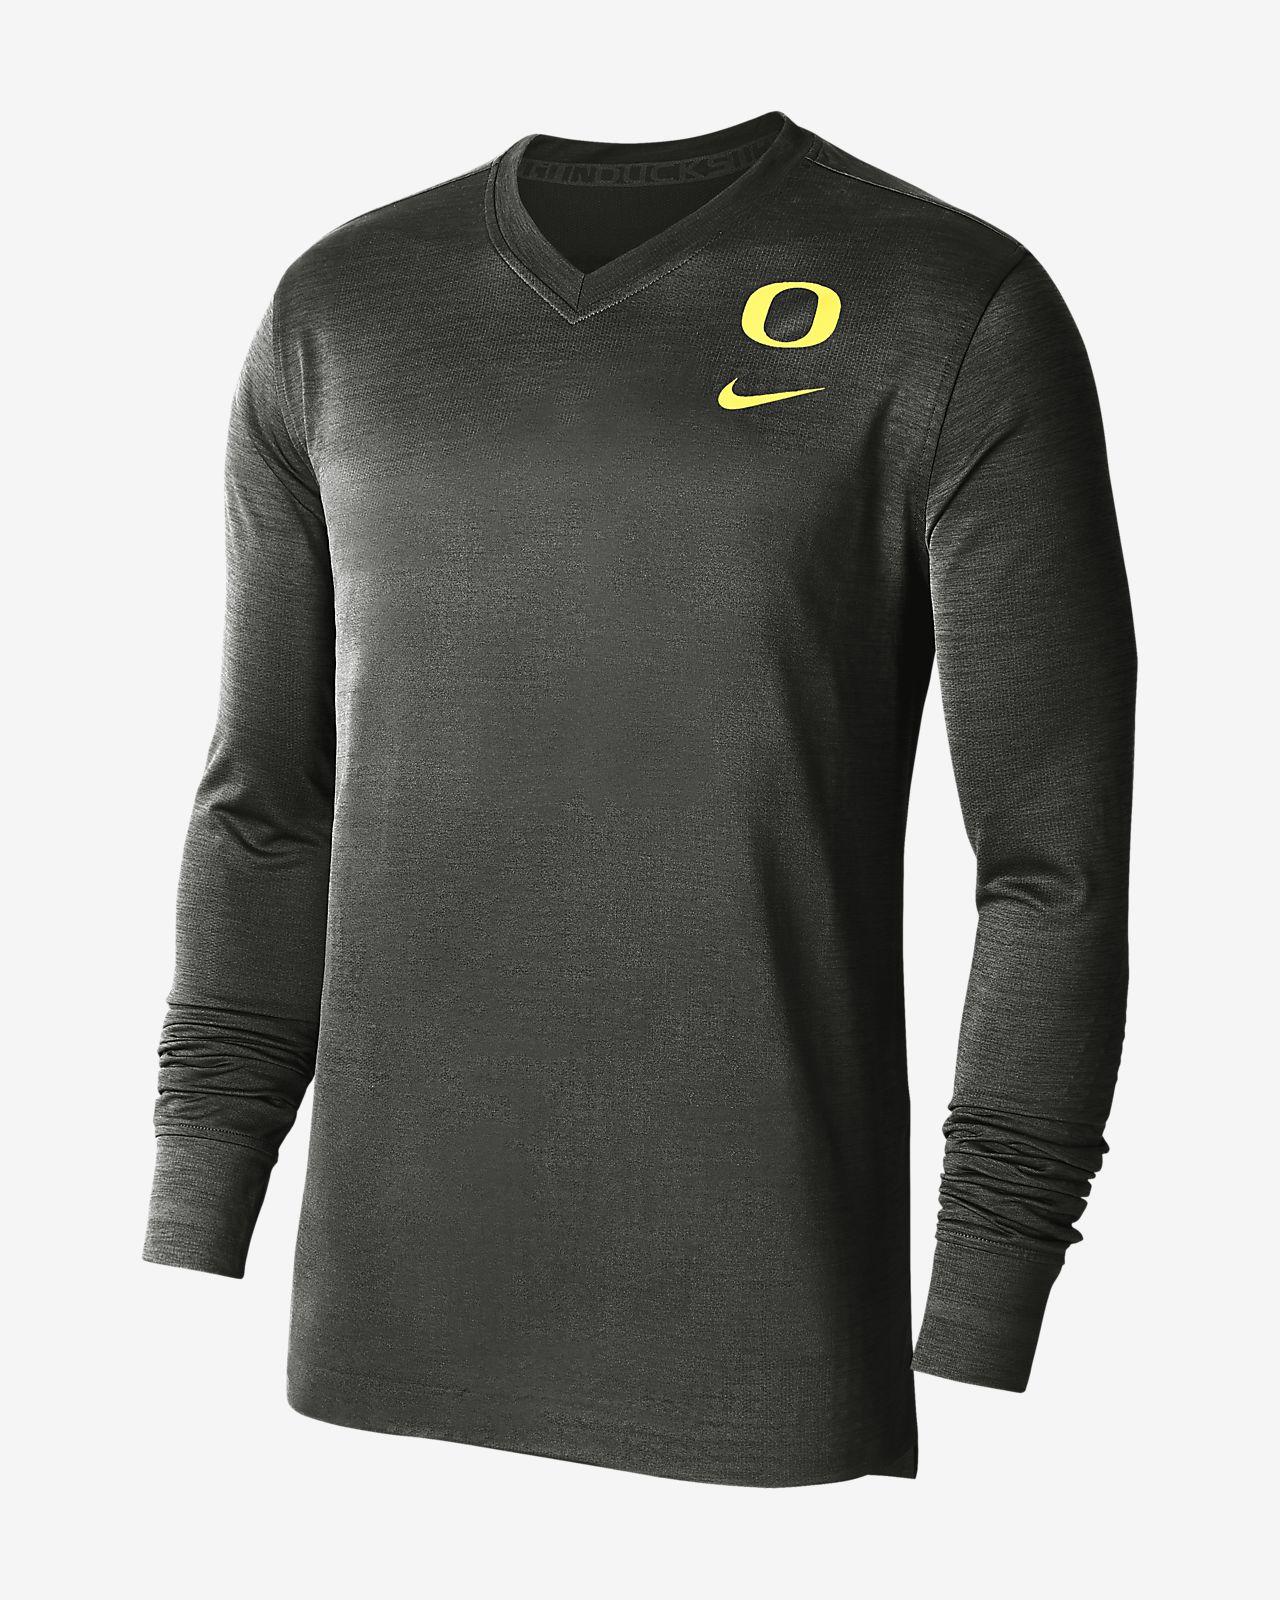 Nike College 360 Player (Oregon) Men's Long-Sleeve Top